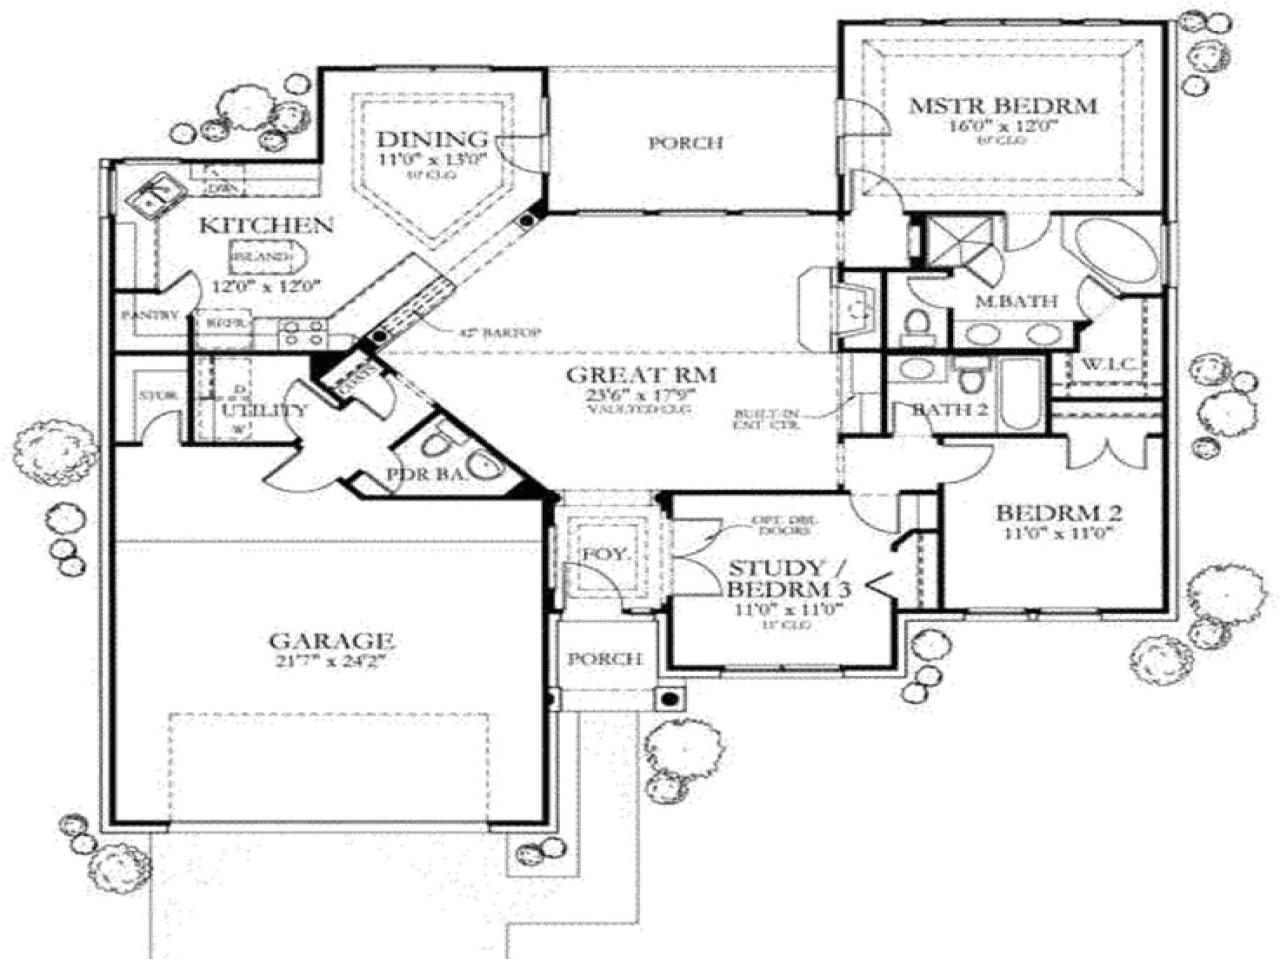 d09d16a0842b05aa 1500 sq ft house floor plans 1500 sq ft one story house plans